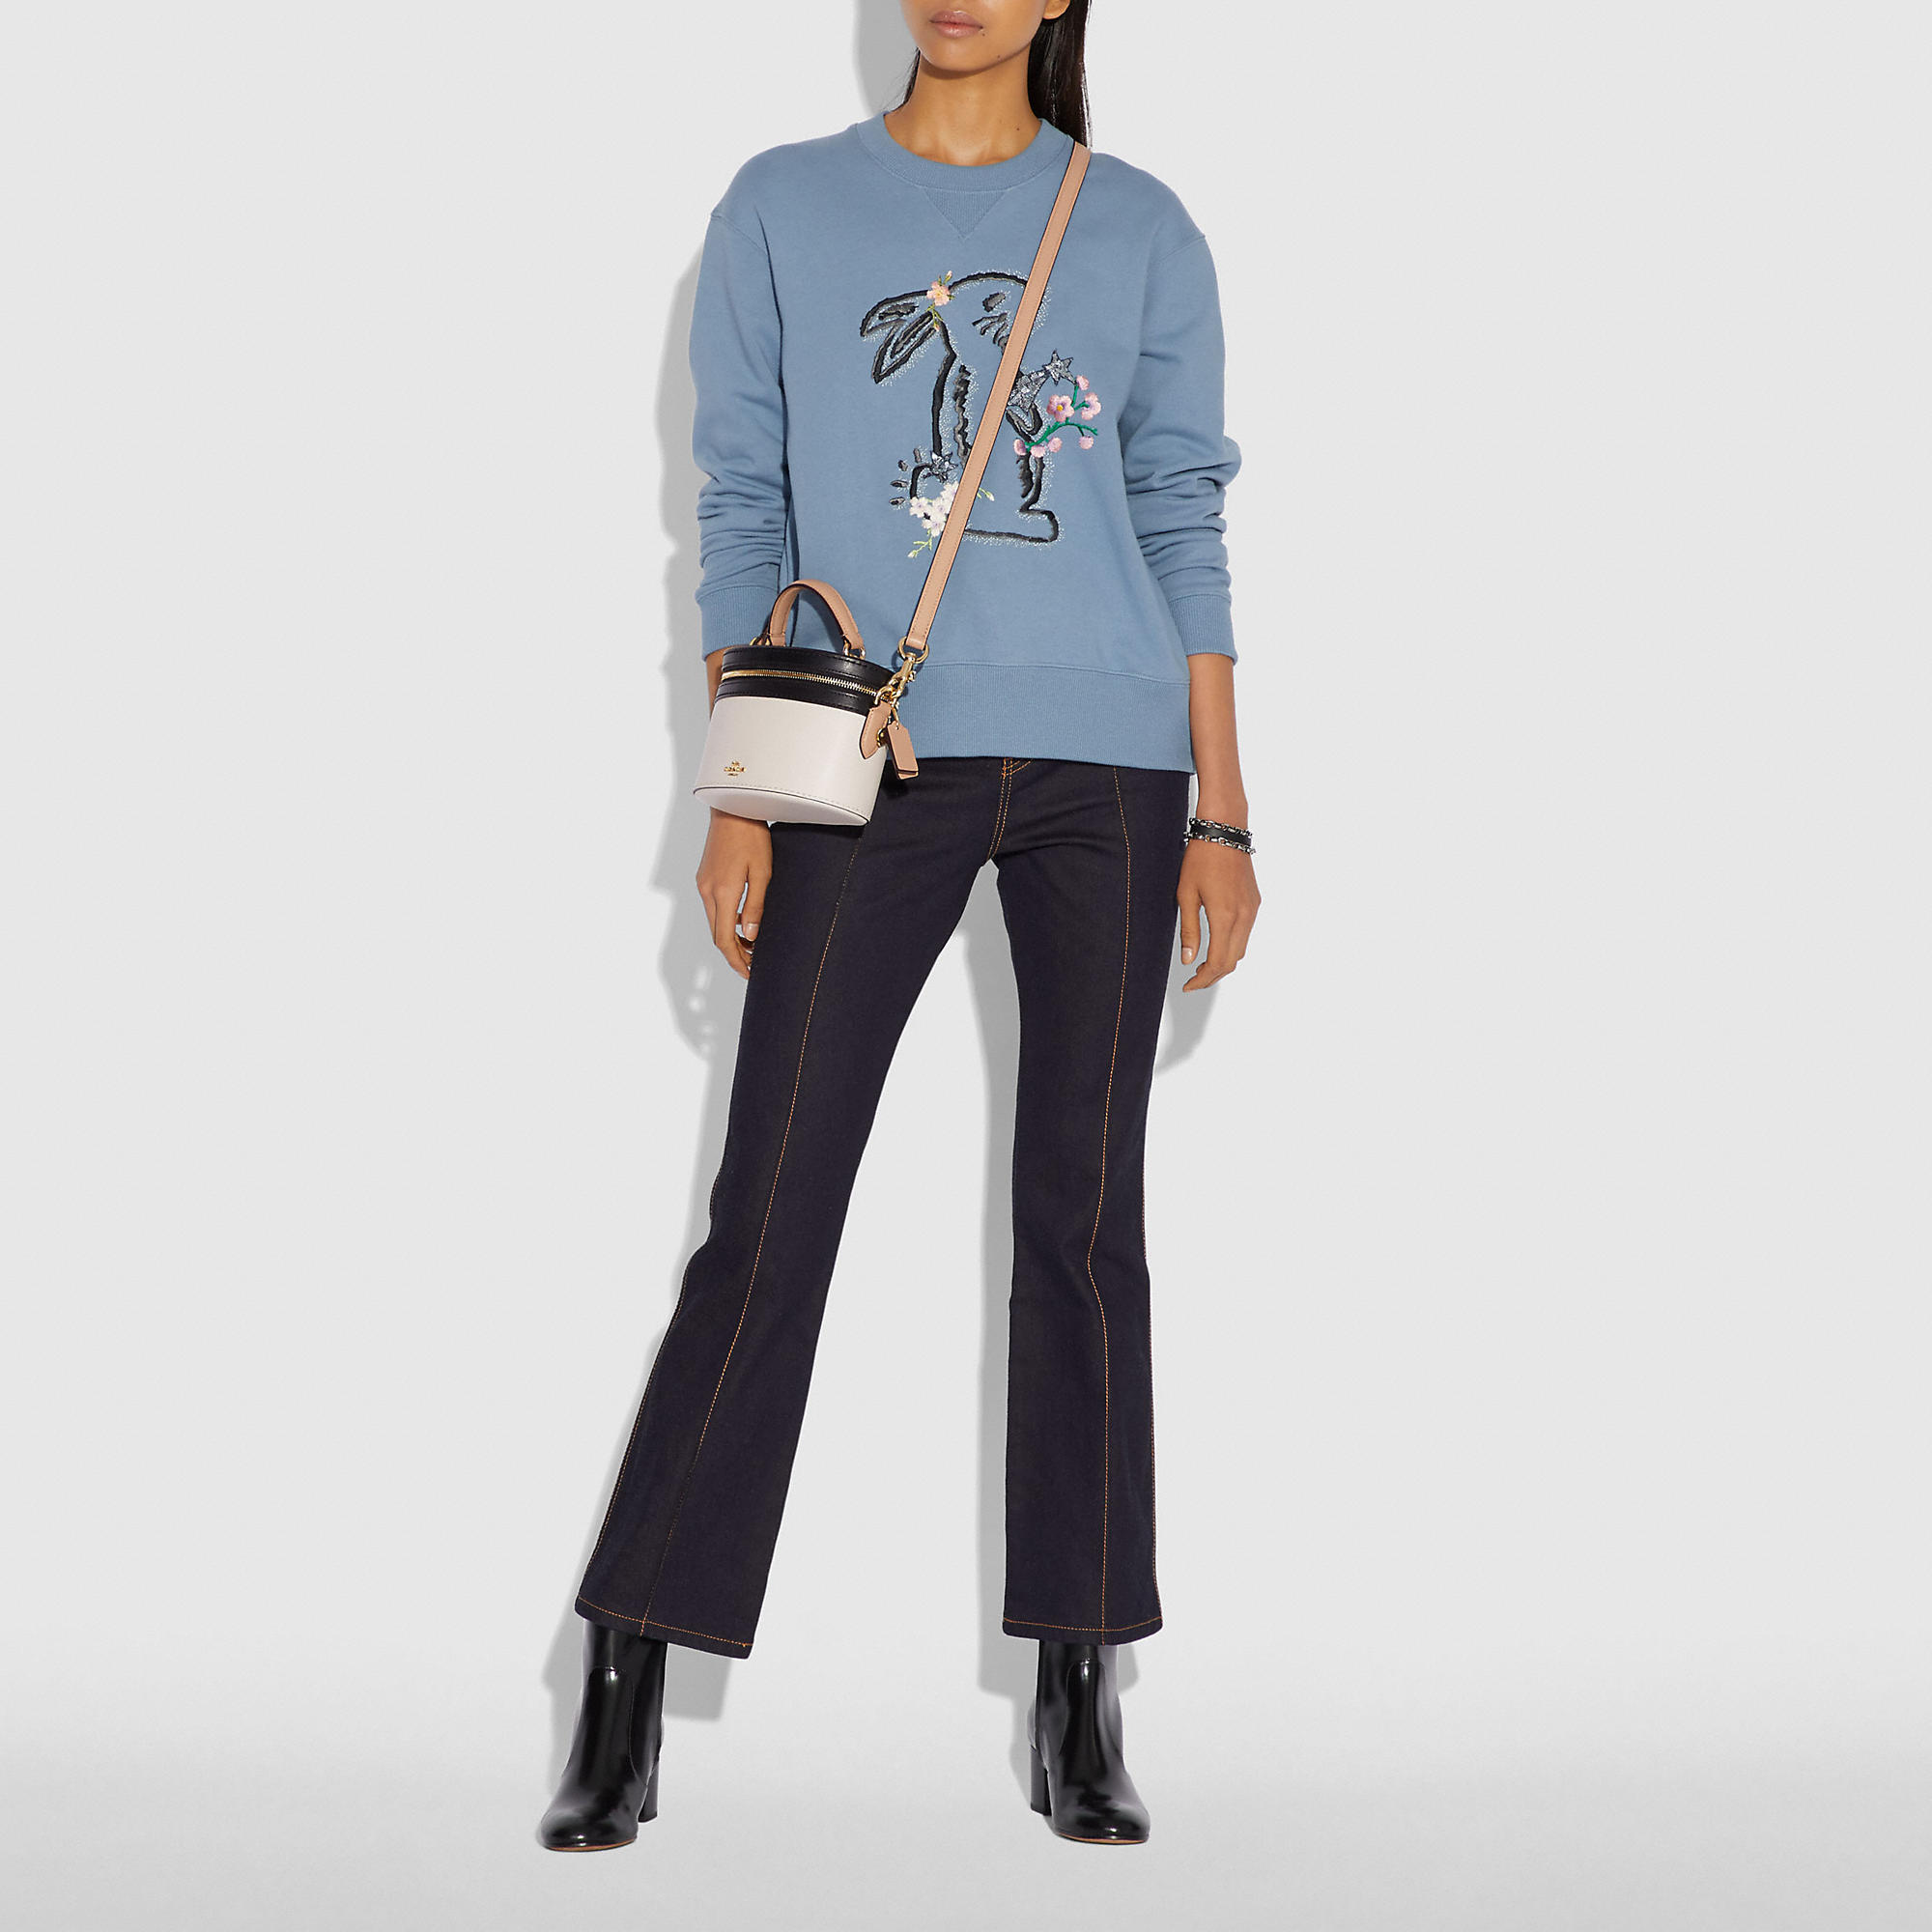 91f10cc36e1a COACH Selena Trail Bag In Colorblock - Women s Designer Crossbody ...